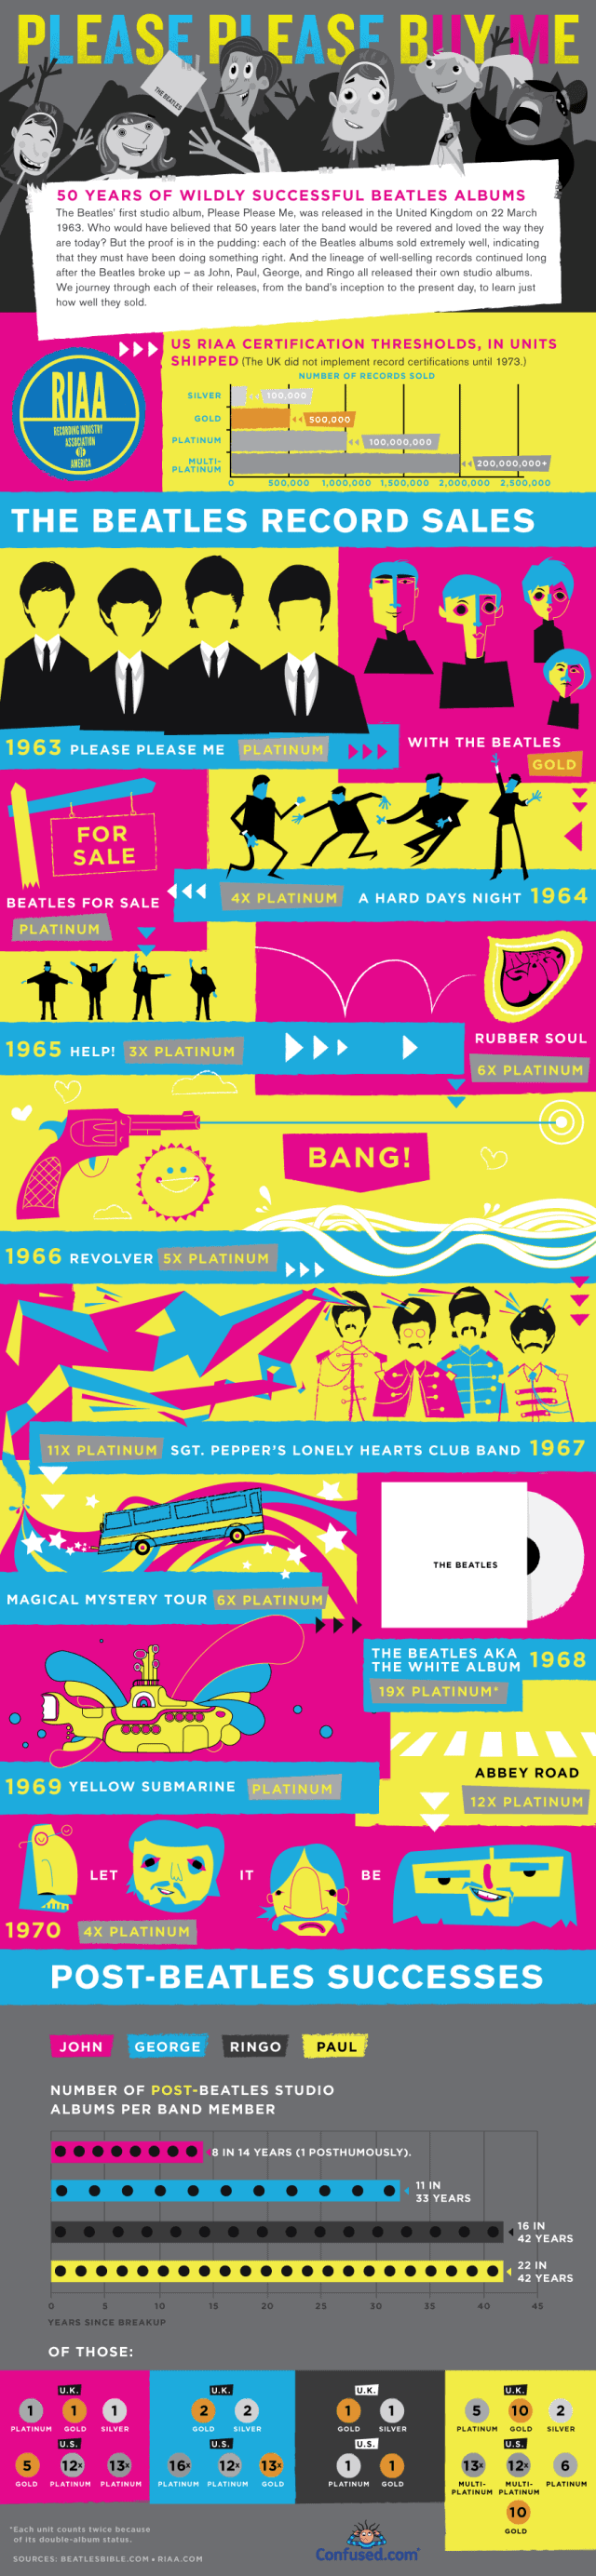 50 Years of Beatles Album